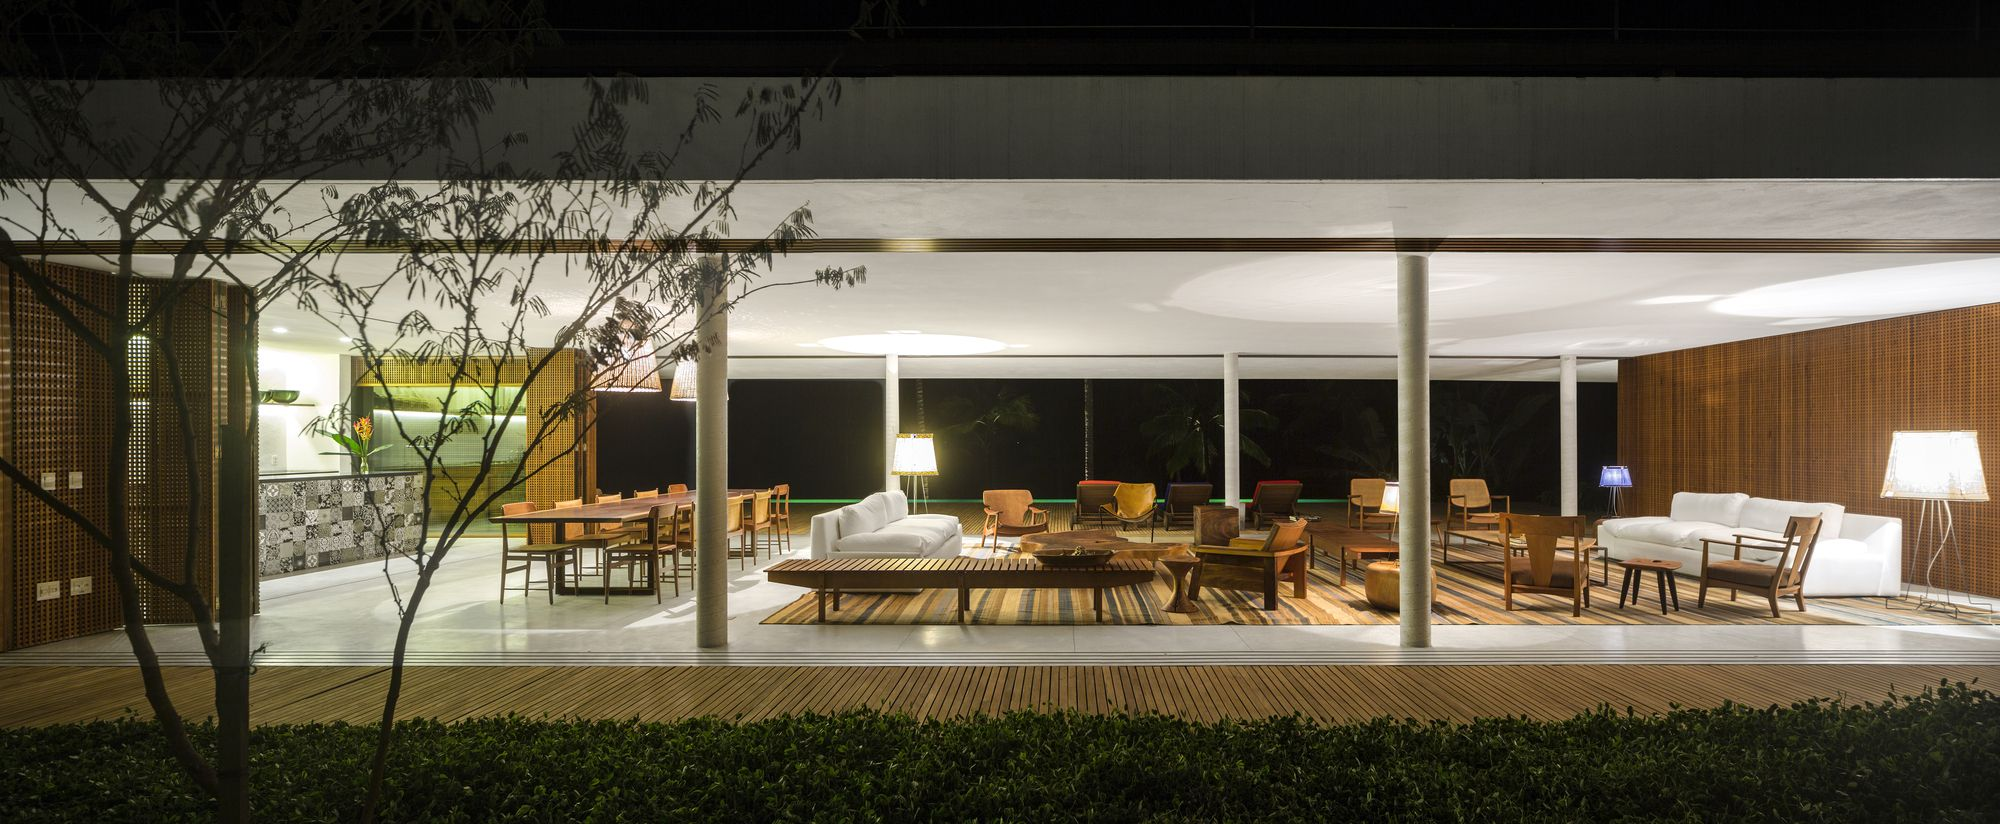 Open layout house concept by studio mk27 - Gallery Of Txai House Studio Mk27 Marcio Kogan Carolina Castroviejo Gabriel Kogan 33